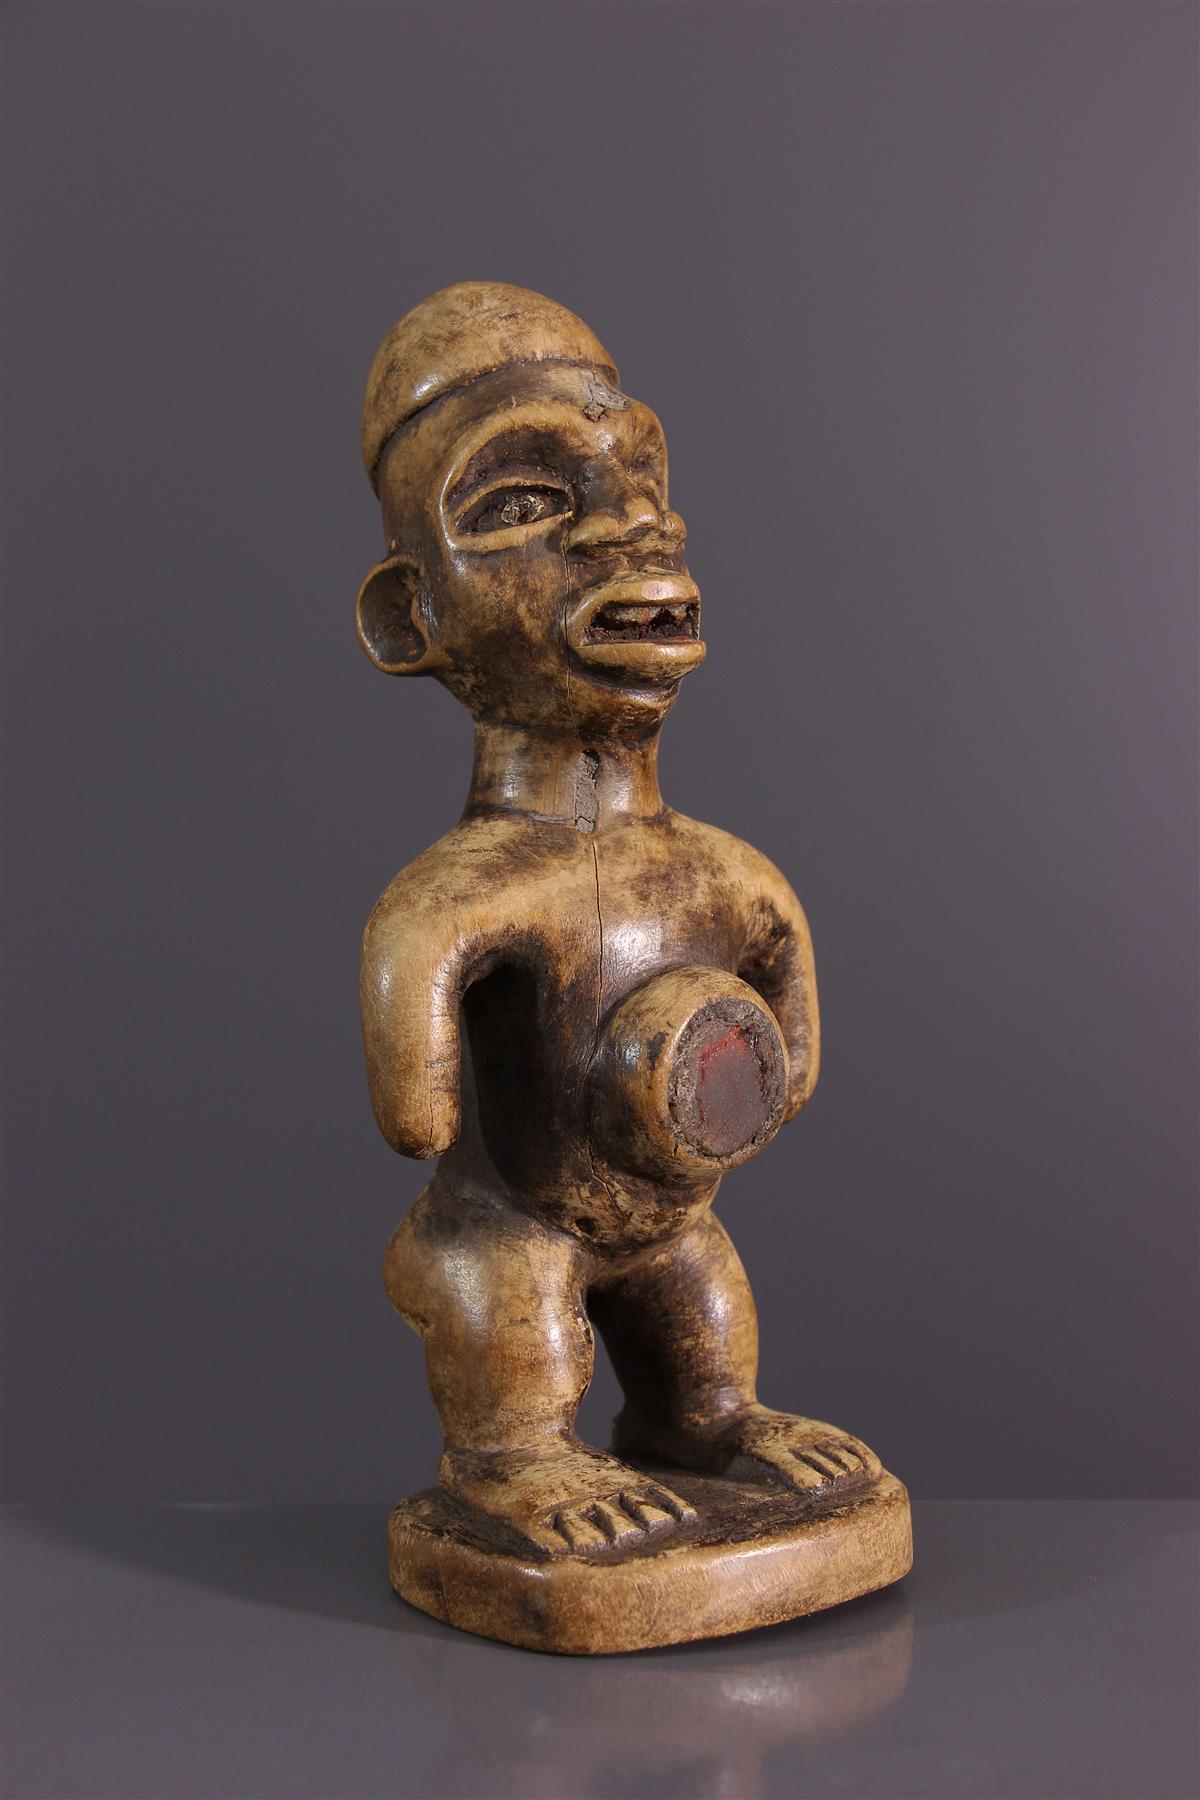 Fétiche Nkisi - African art